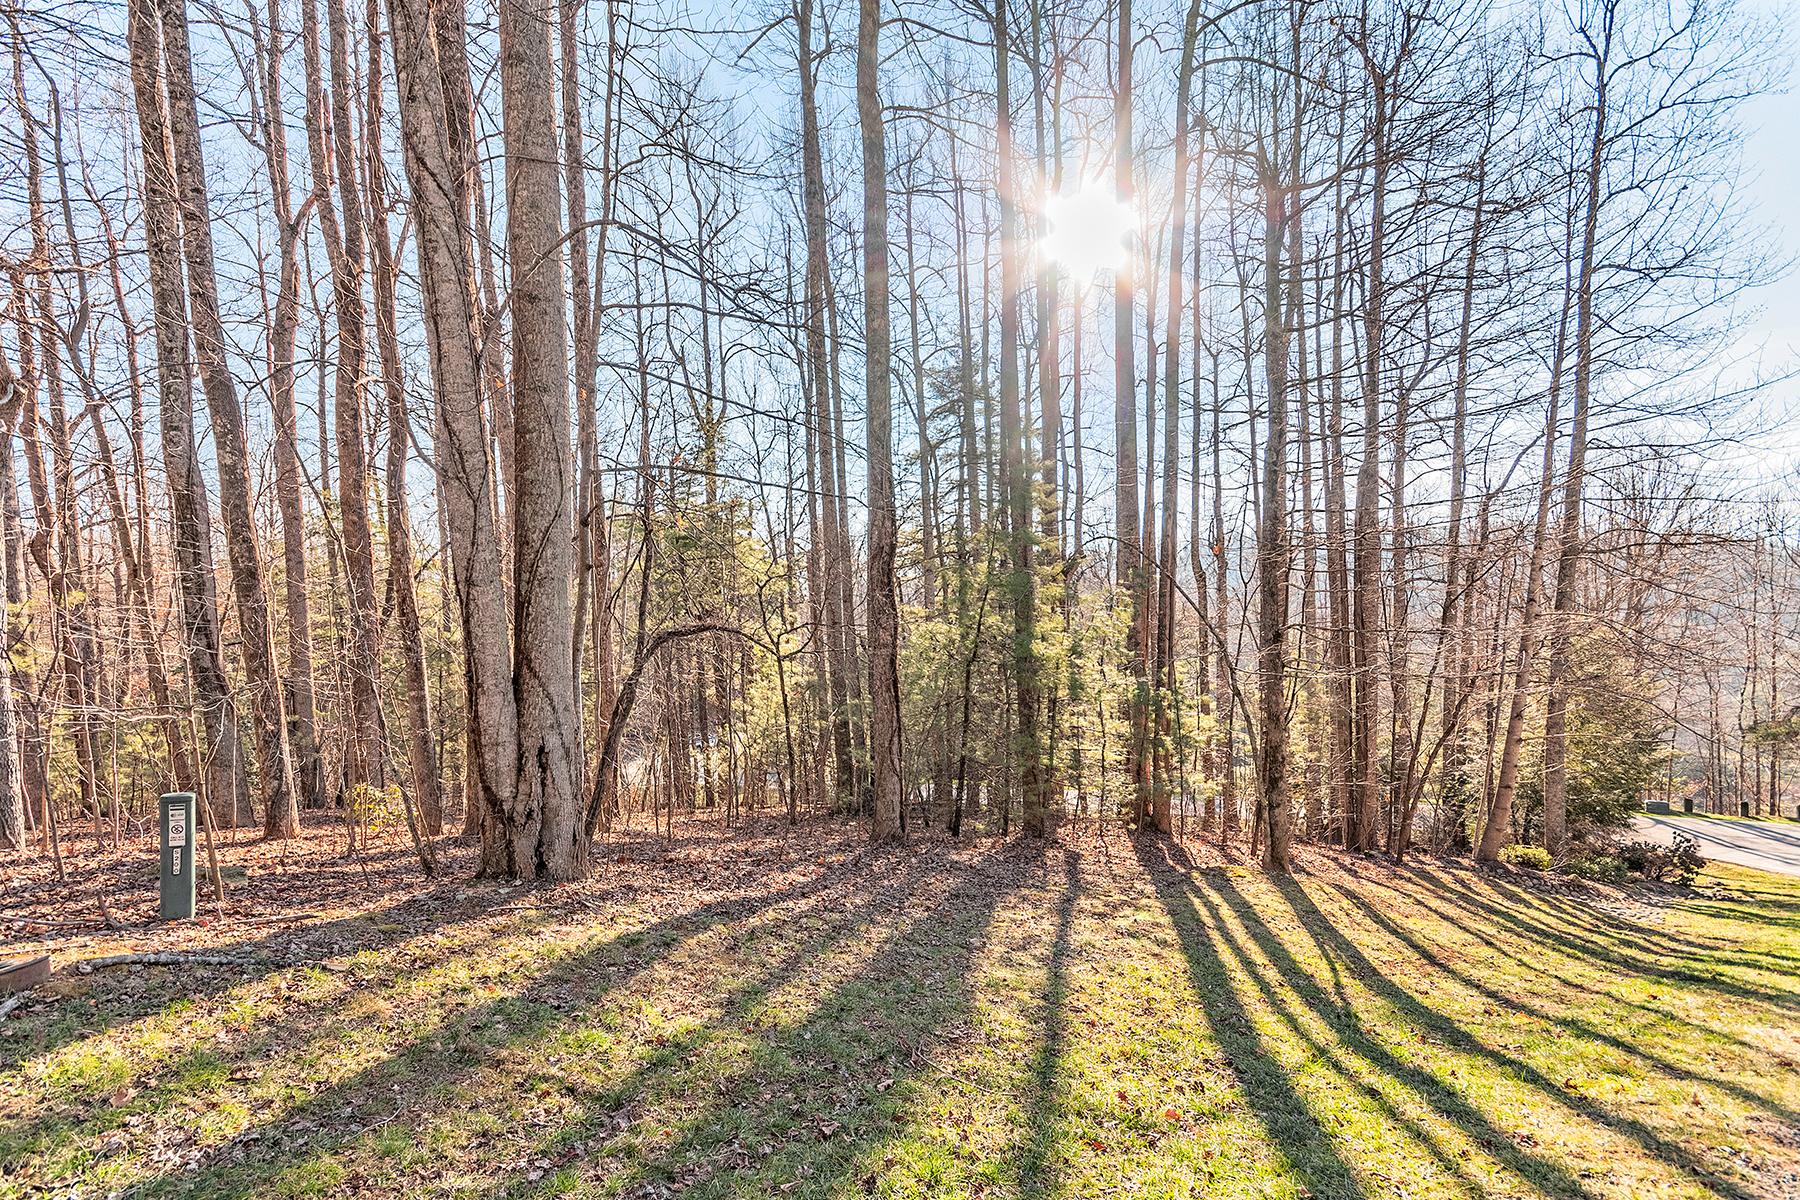 Land for Sale at PREMIUM BUILD SITE IN CHAMPION HILLS 200 Bent Pine 162, Hendersonville, North Carolina 28739 United States